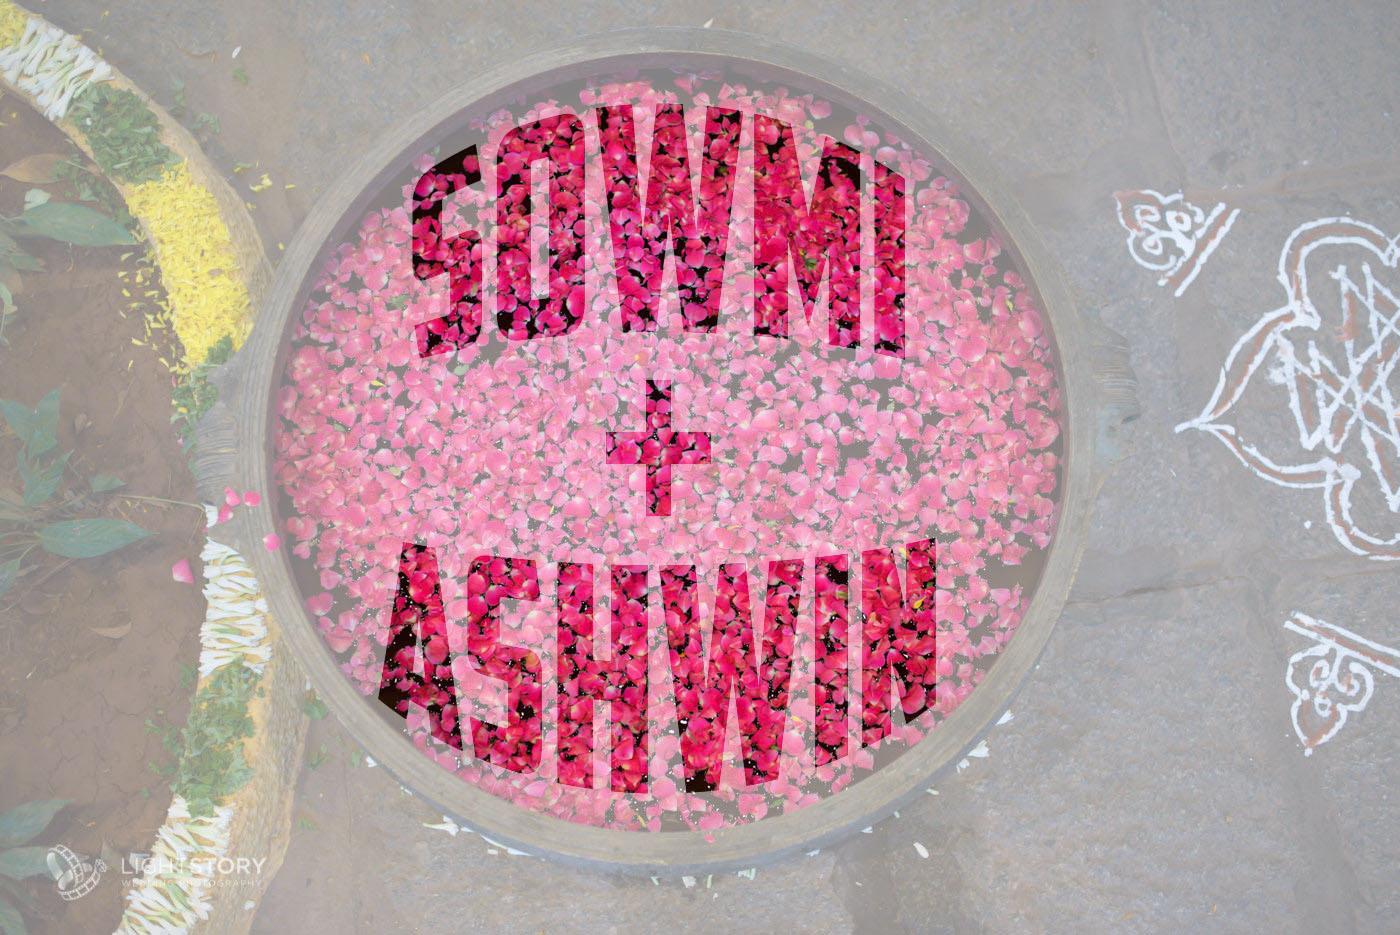 Ashwin + Sowmi - a charming wedding at Ganjam Madapa, Bangalore